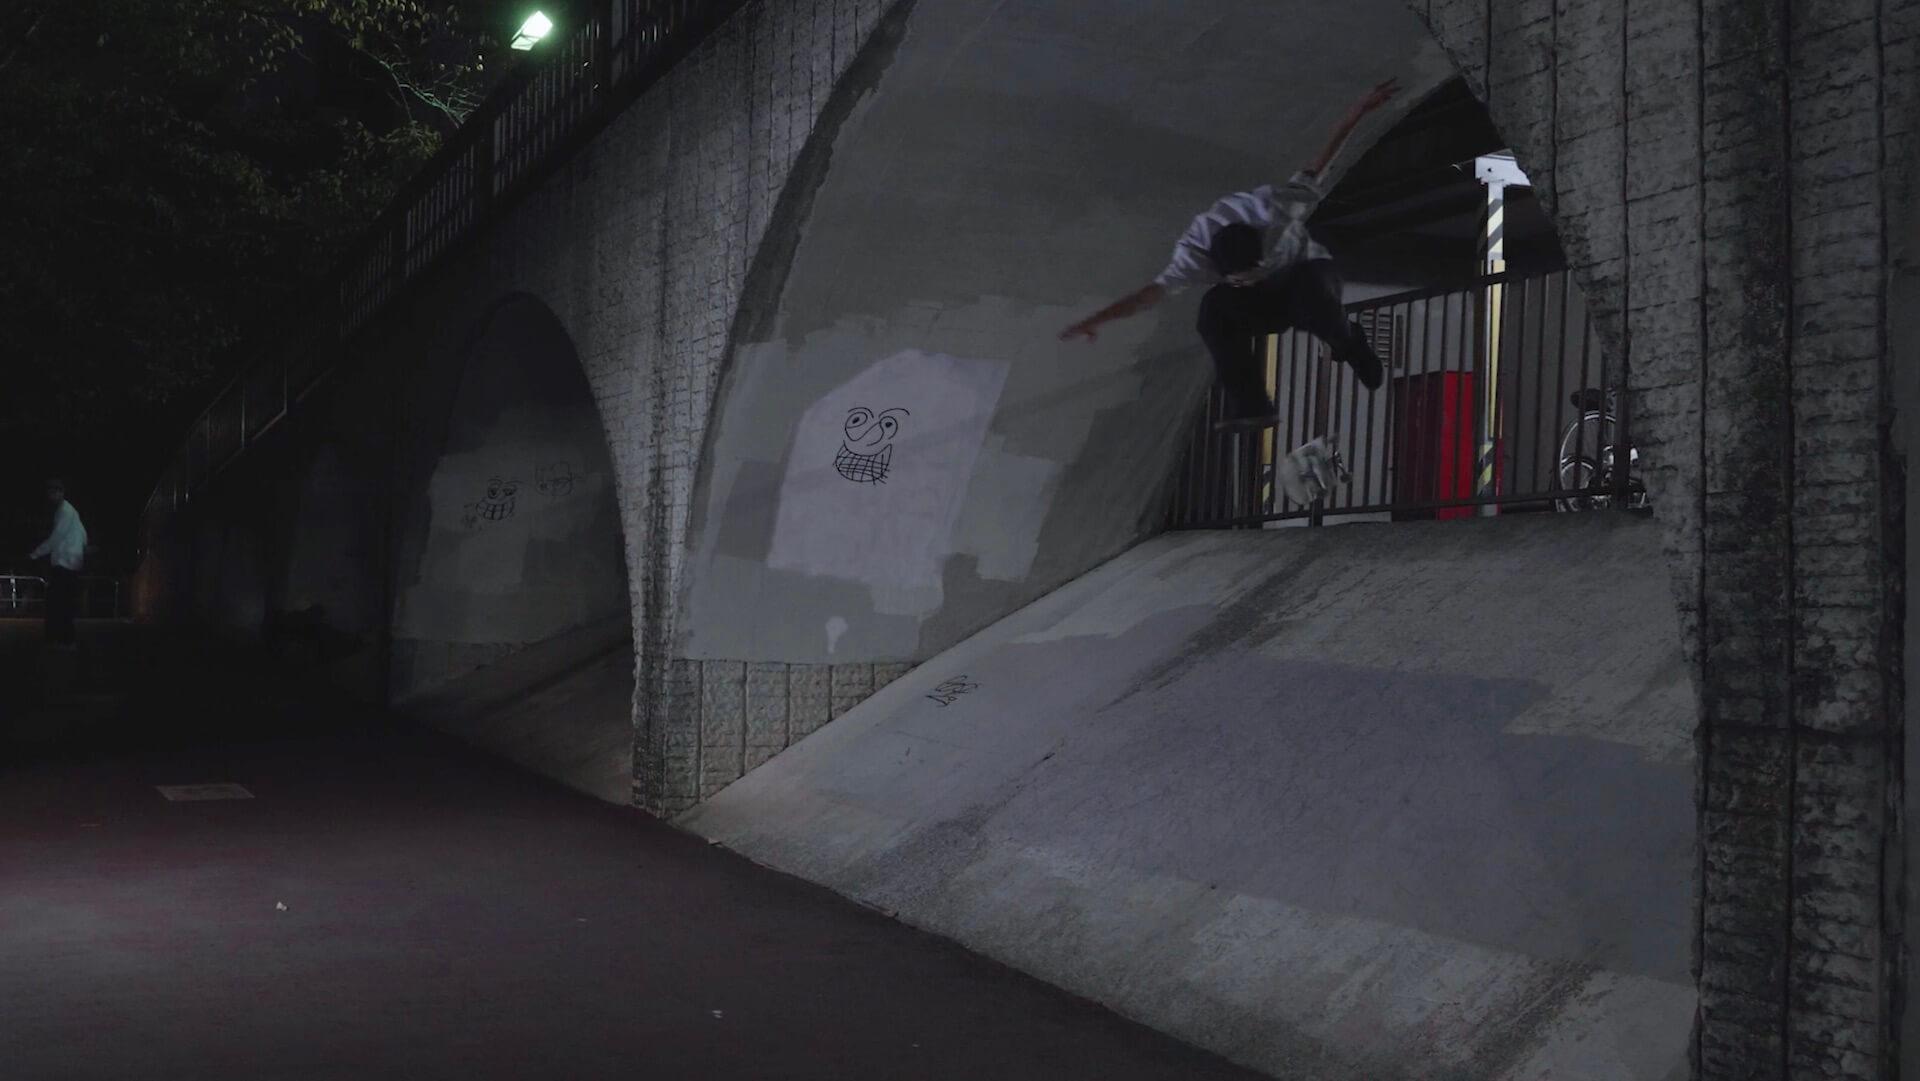 Diaspora skateboardsの新作ビデオ『SYMBIOSIS』の試写イベントにDaichi Yamamoto、tofubeatsが追加出演決定|アフターパーティーにAru-2、Kazuhiko Fujitaも music191226_diasporaskateboards_4